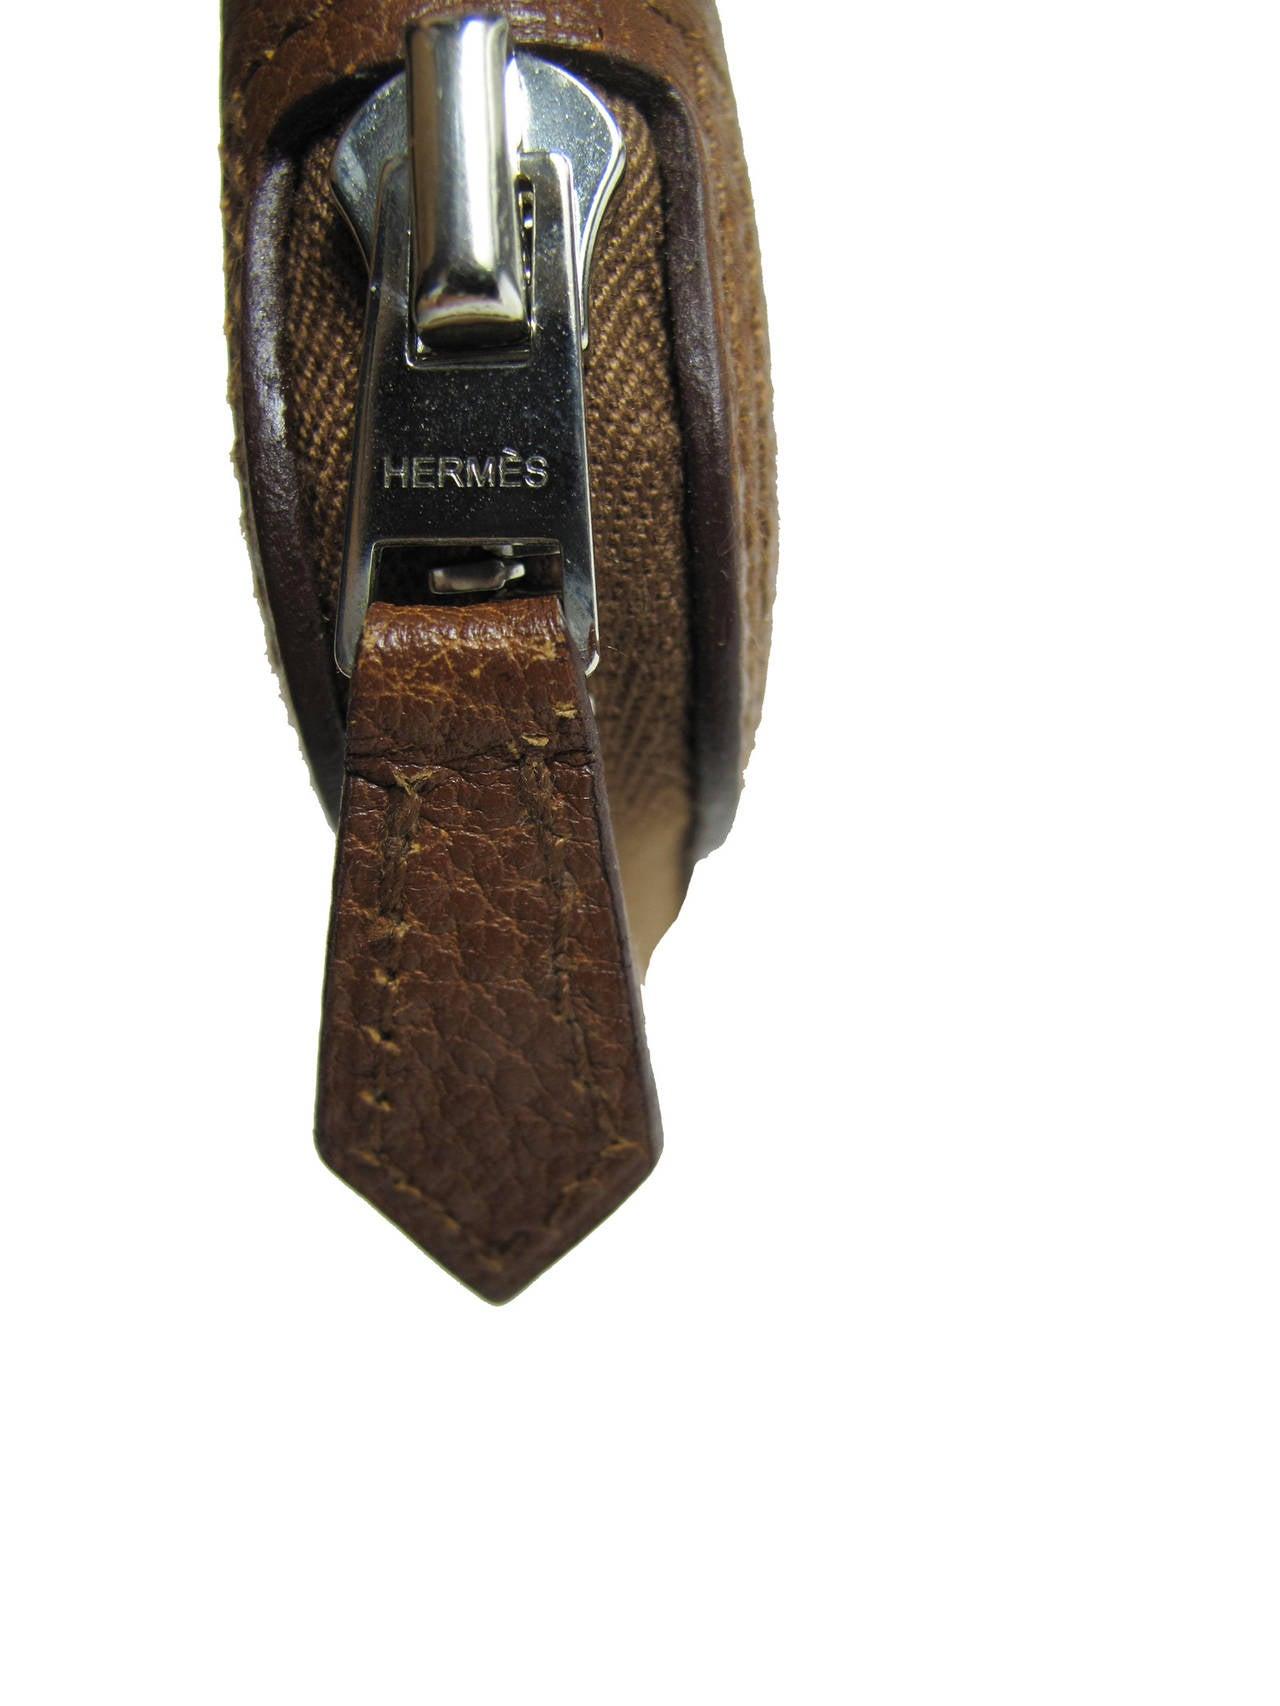 Rare Hermes Orange H Shopper Tote Collapsible Zip Handbag - sale 3